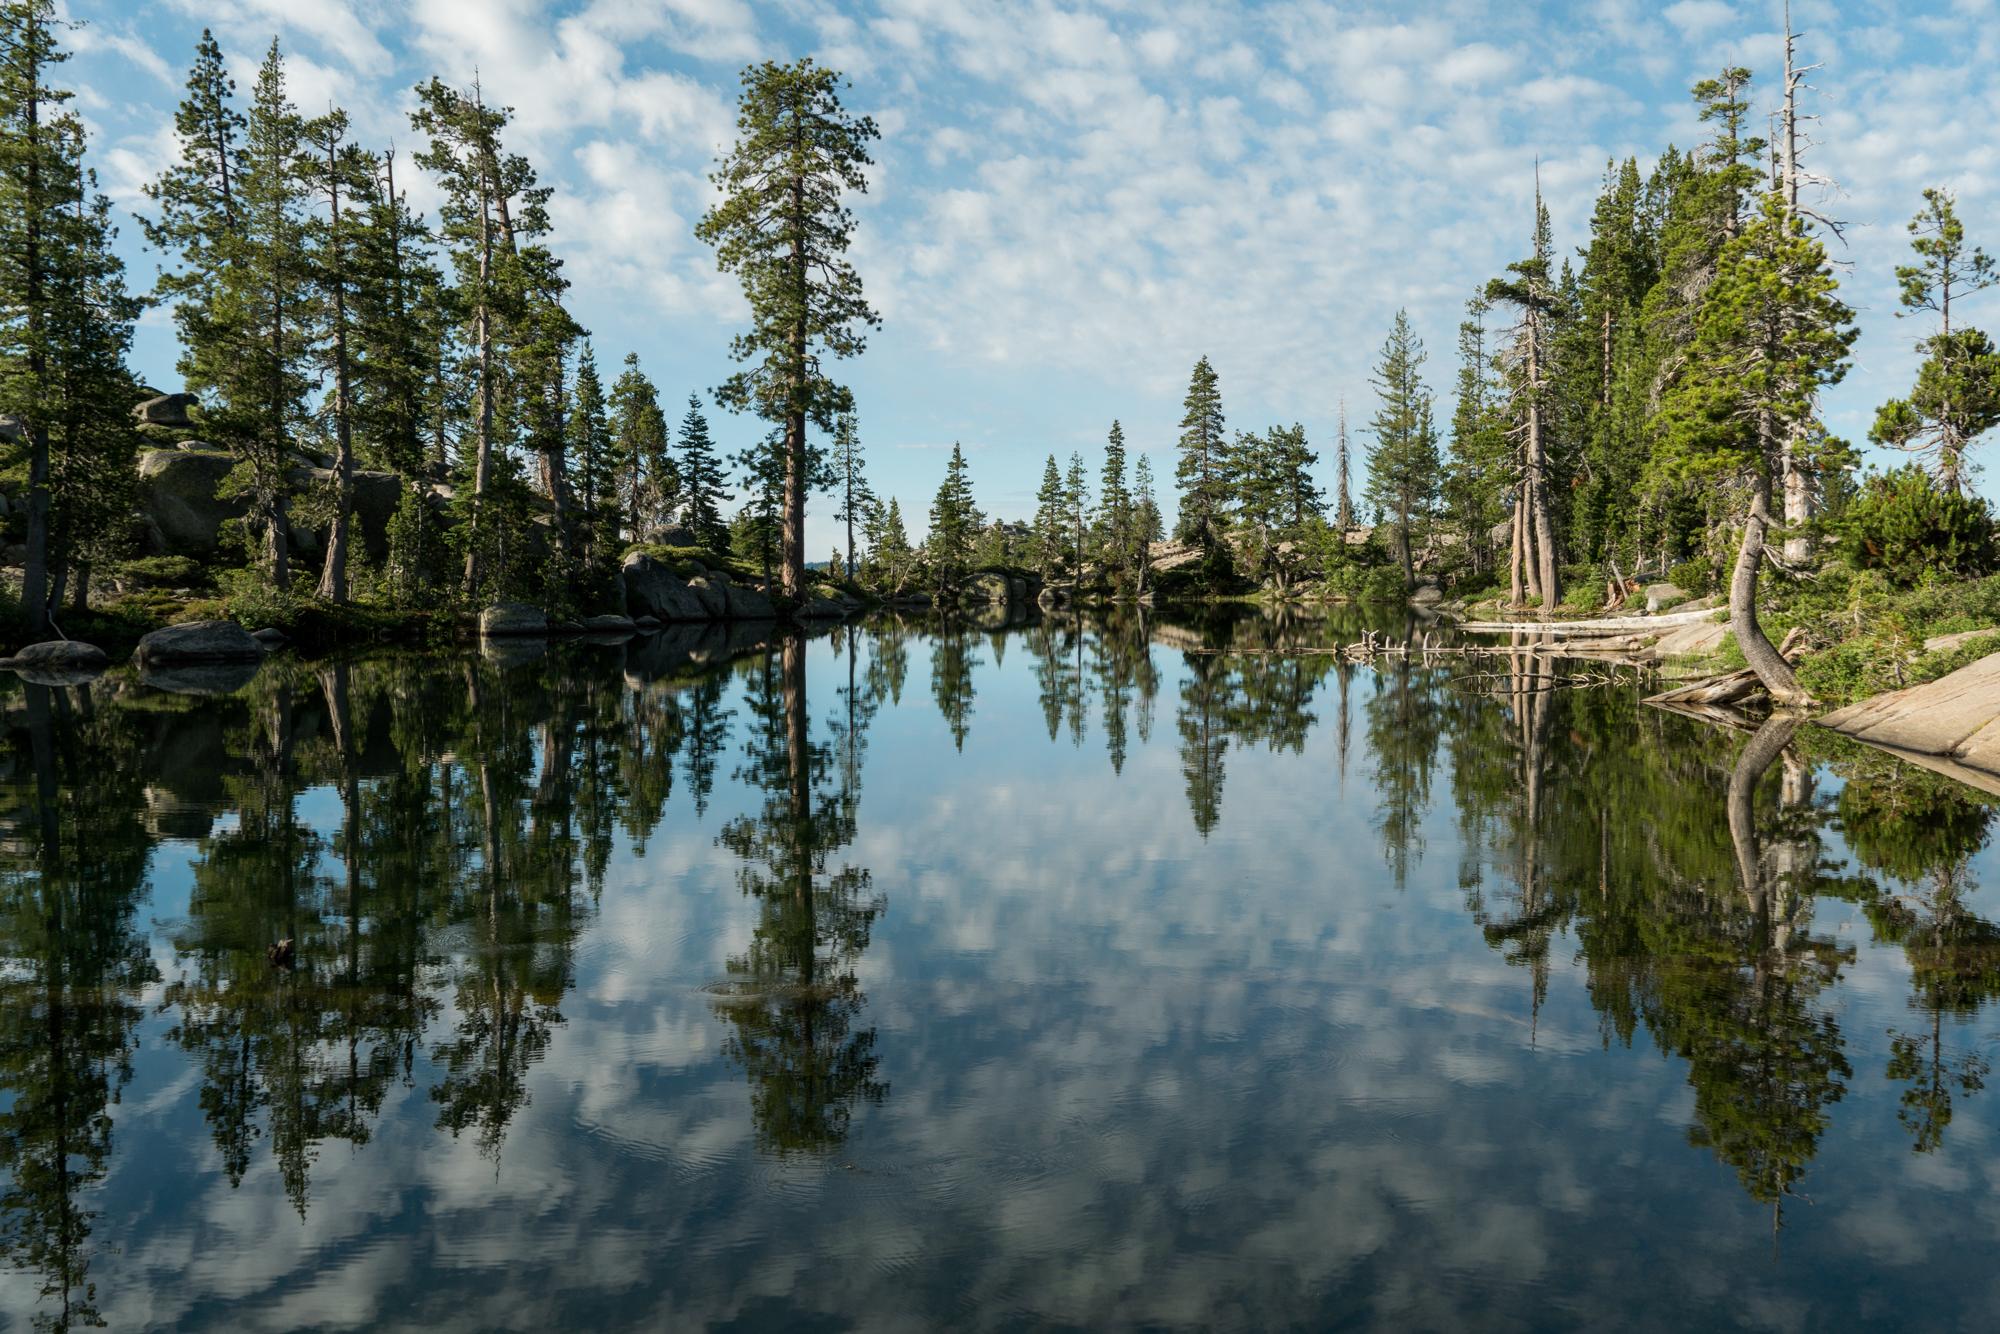 Summer-LakeTahoe-12.jpg